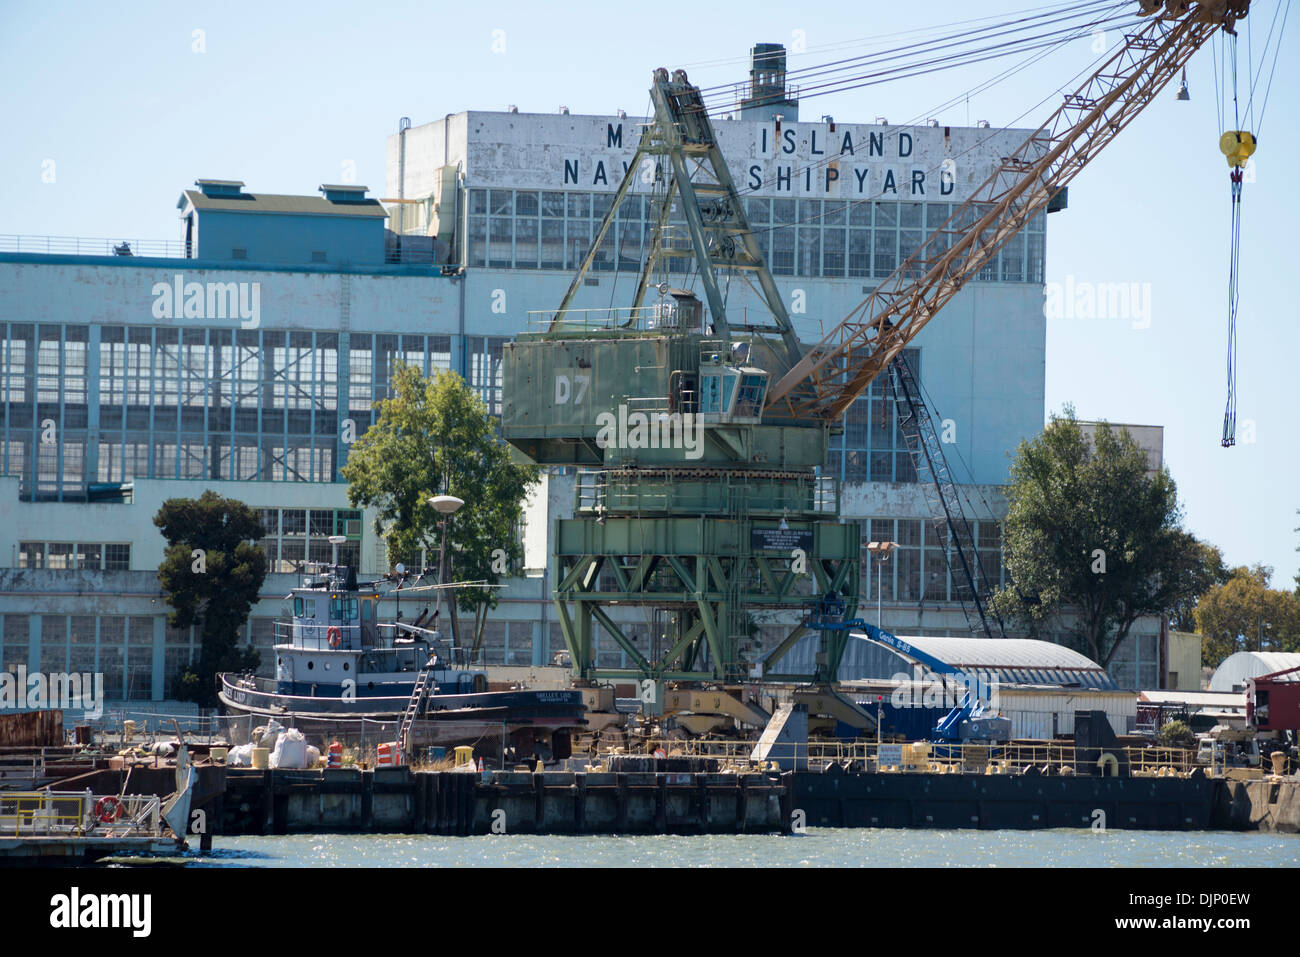 Where Is Mare Island Naval Shipyard